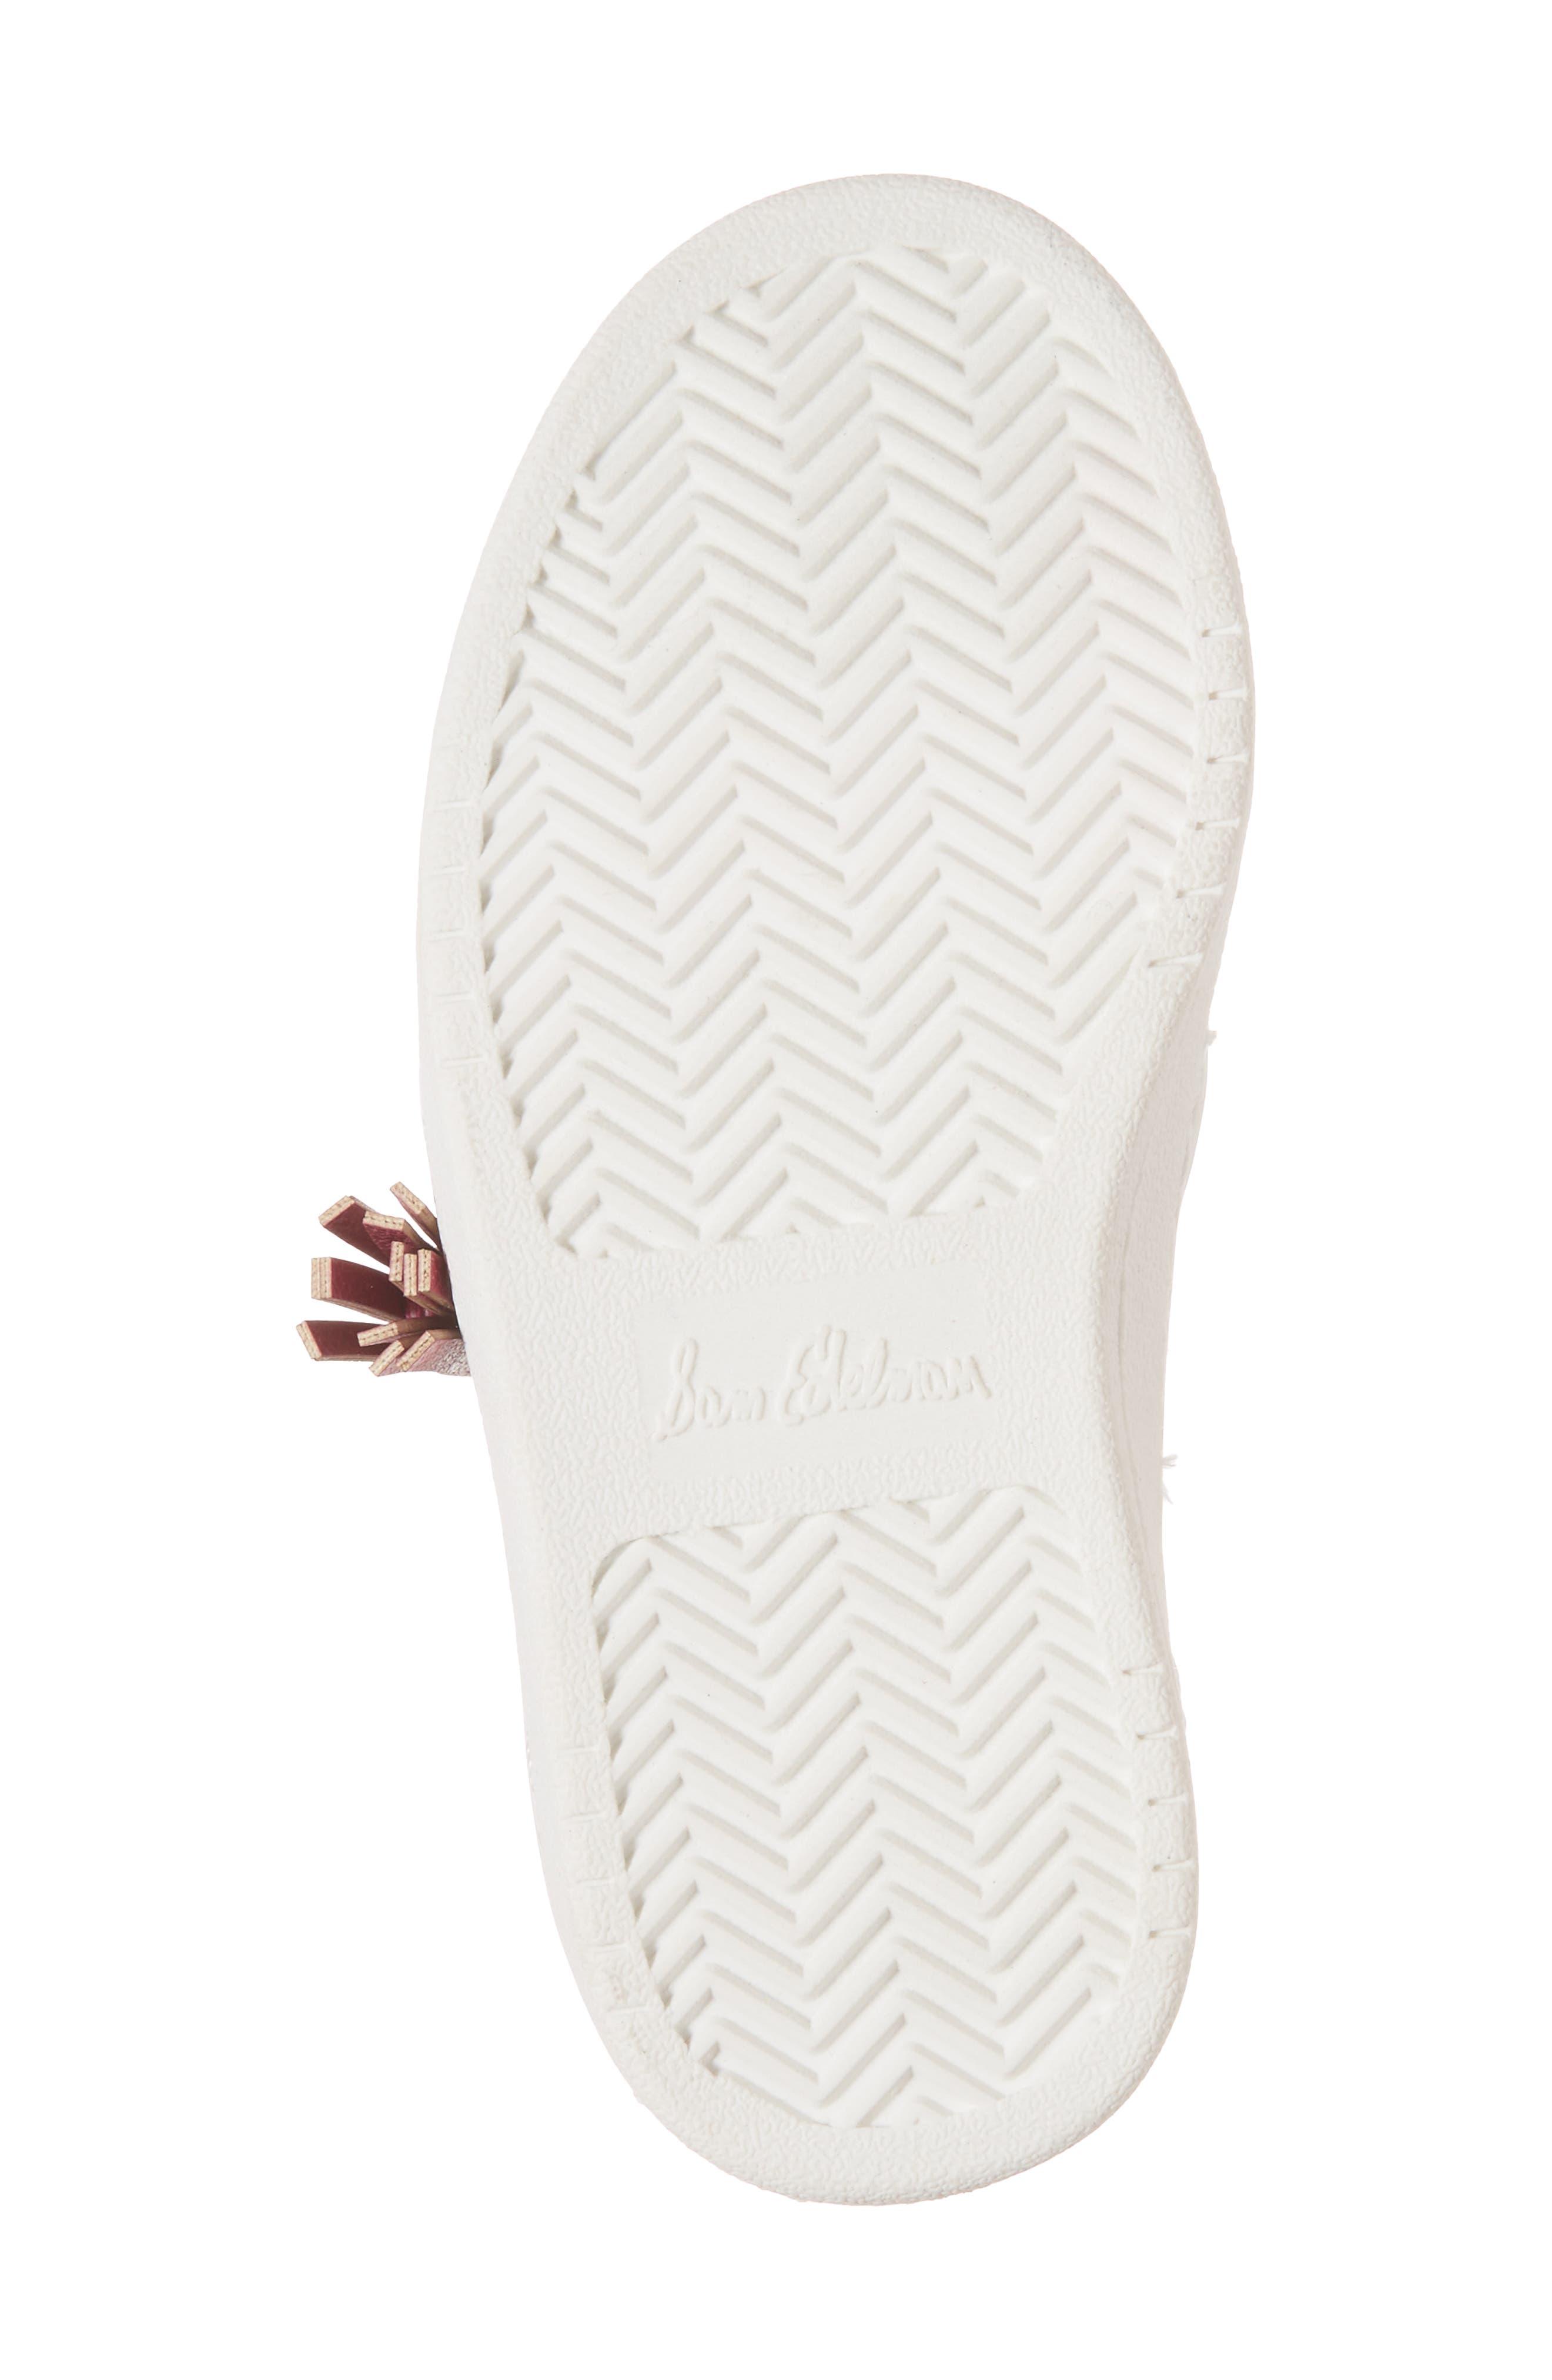 Blane Watermelon Sneaker,                             Alternate thumbnail 6, color,                             Fuchsia Patent Leather